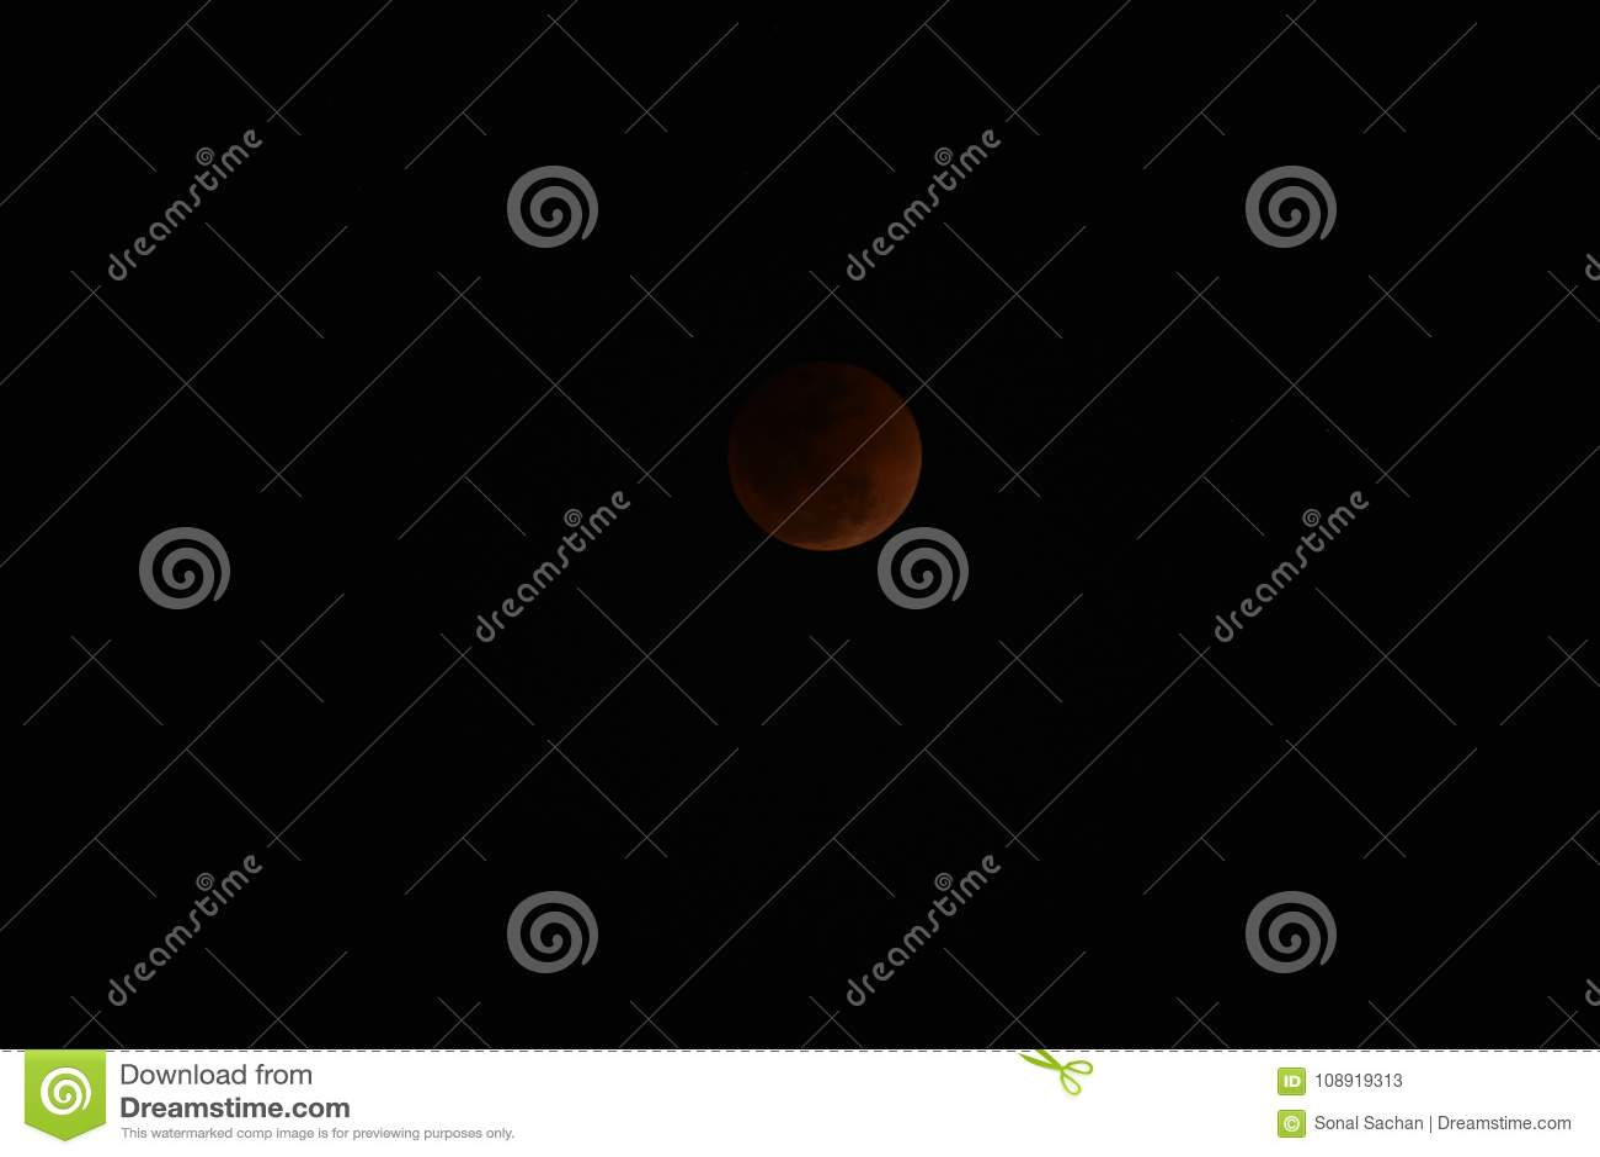 super blue blood moon lunar eclipse india